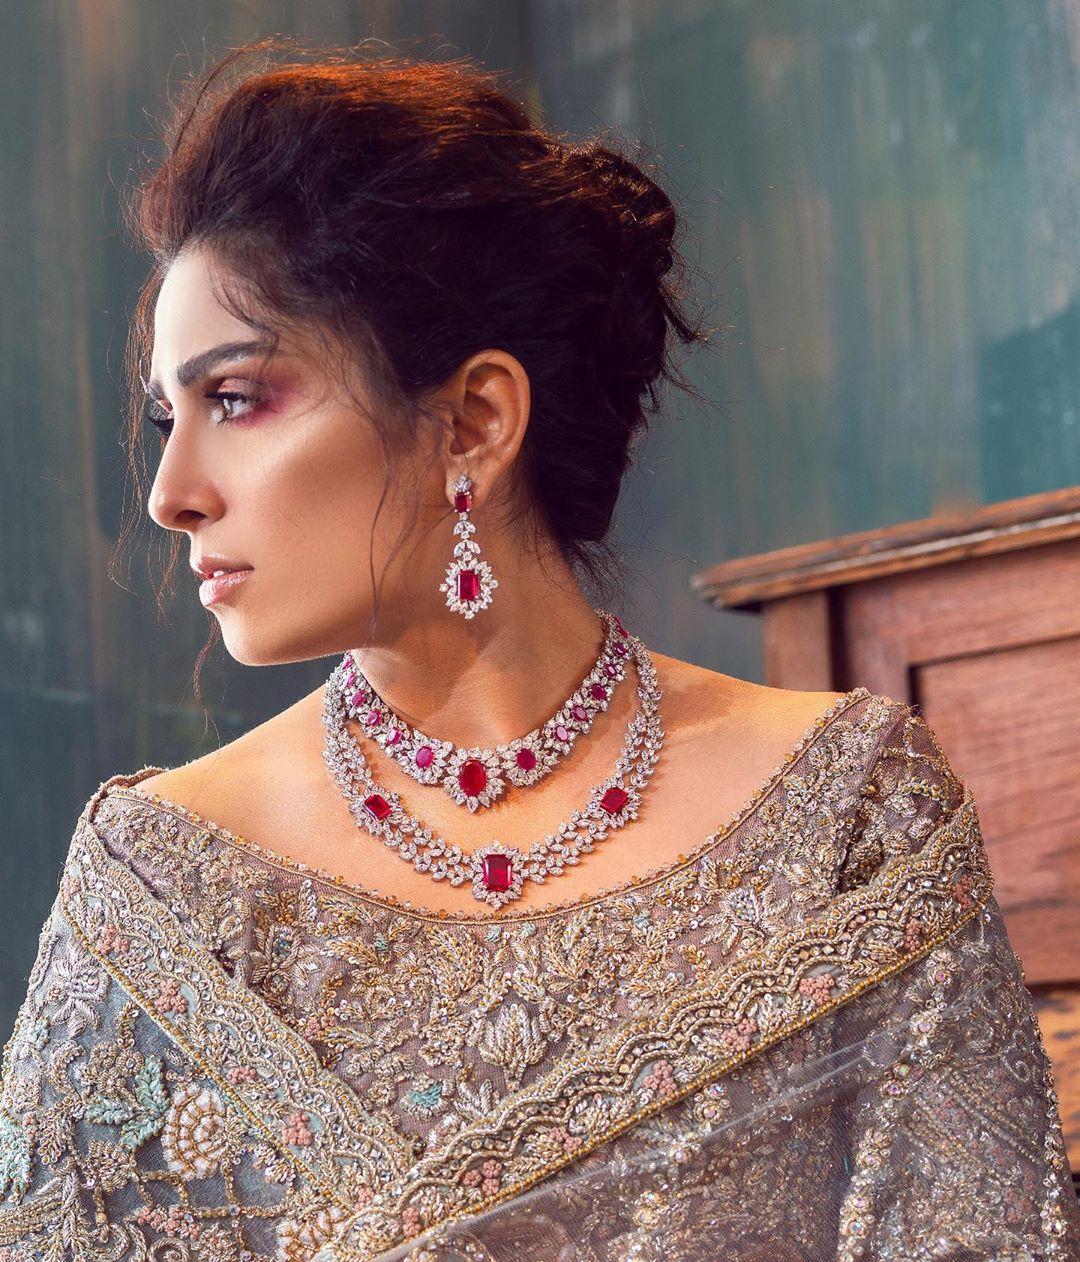 Ayeza Khan New Photo Shoot in Beautiful Dress for Sara Rohale Asghar